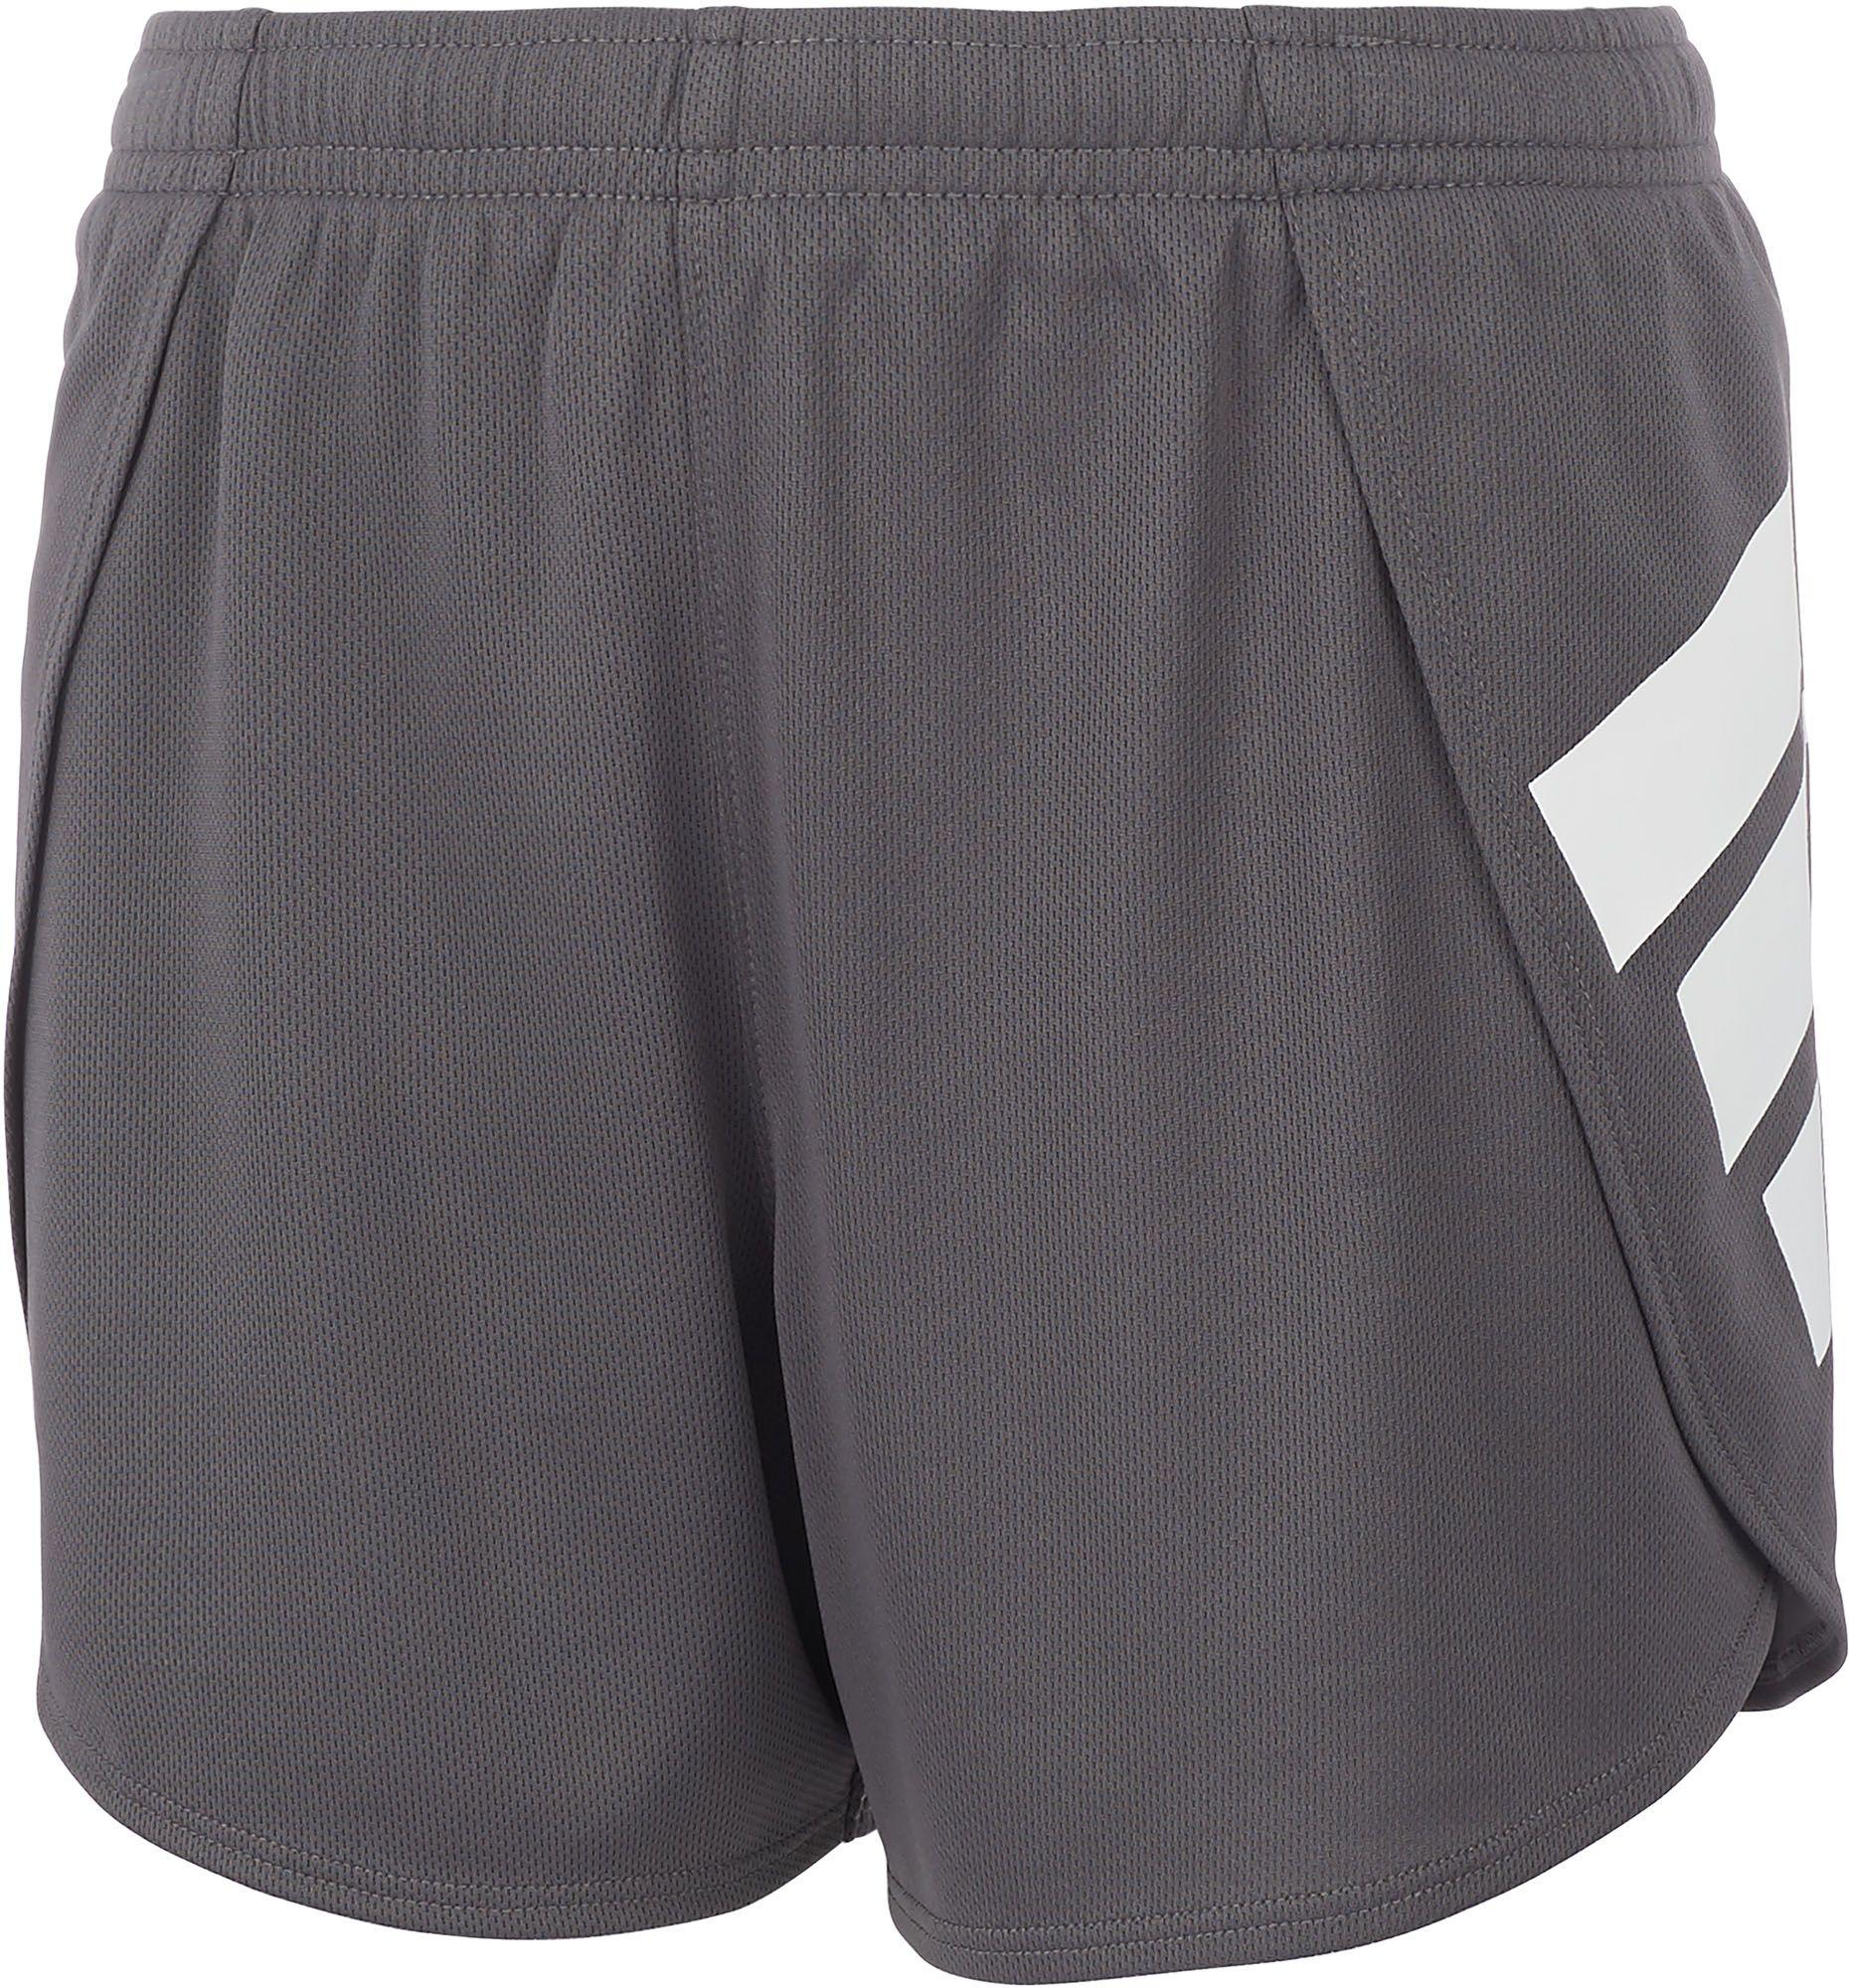 adidas performance shorts